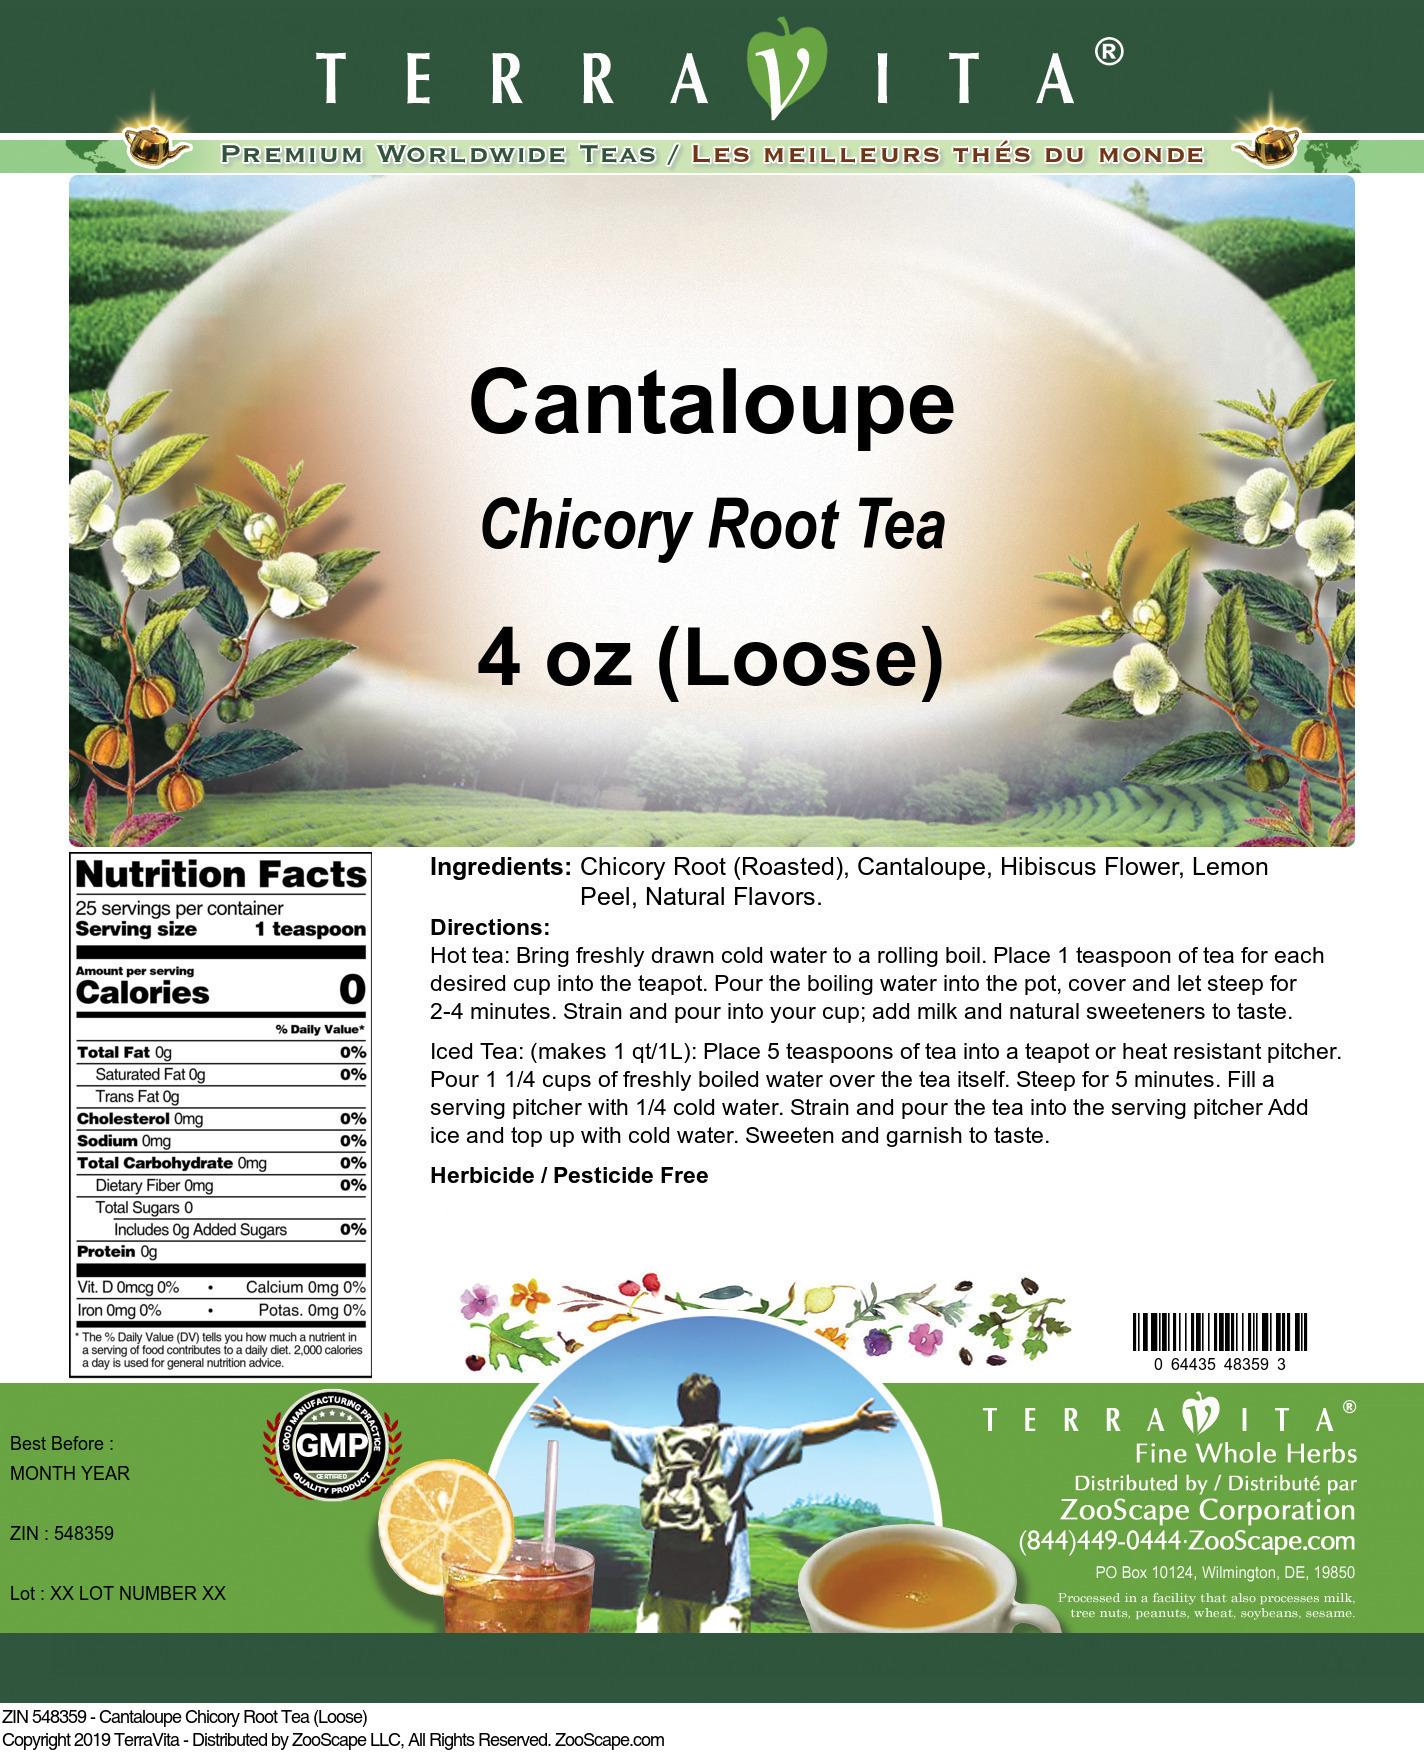 Cantaloupe Chicory Root